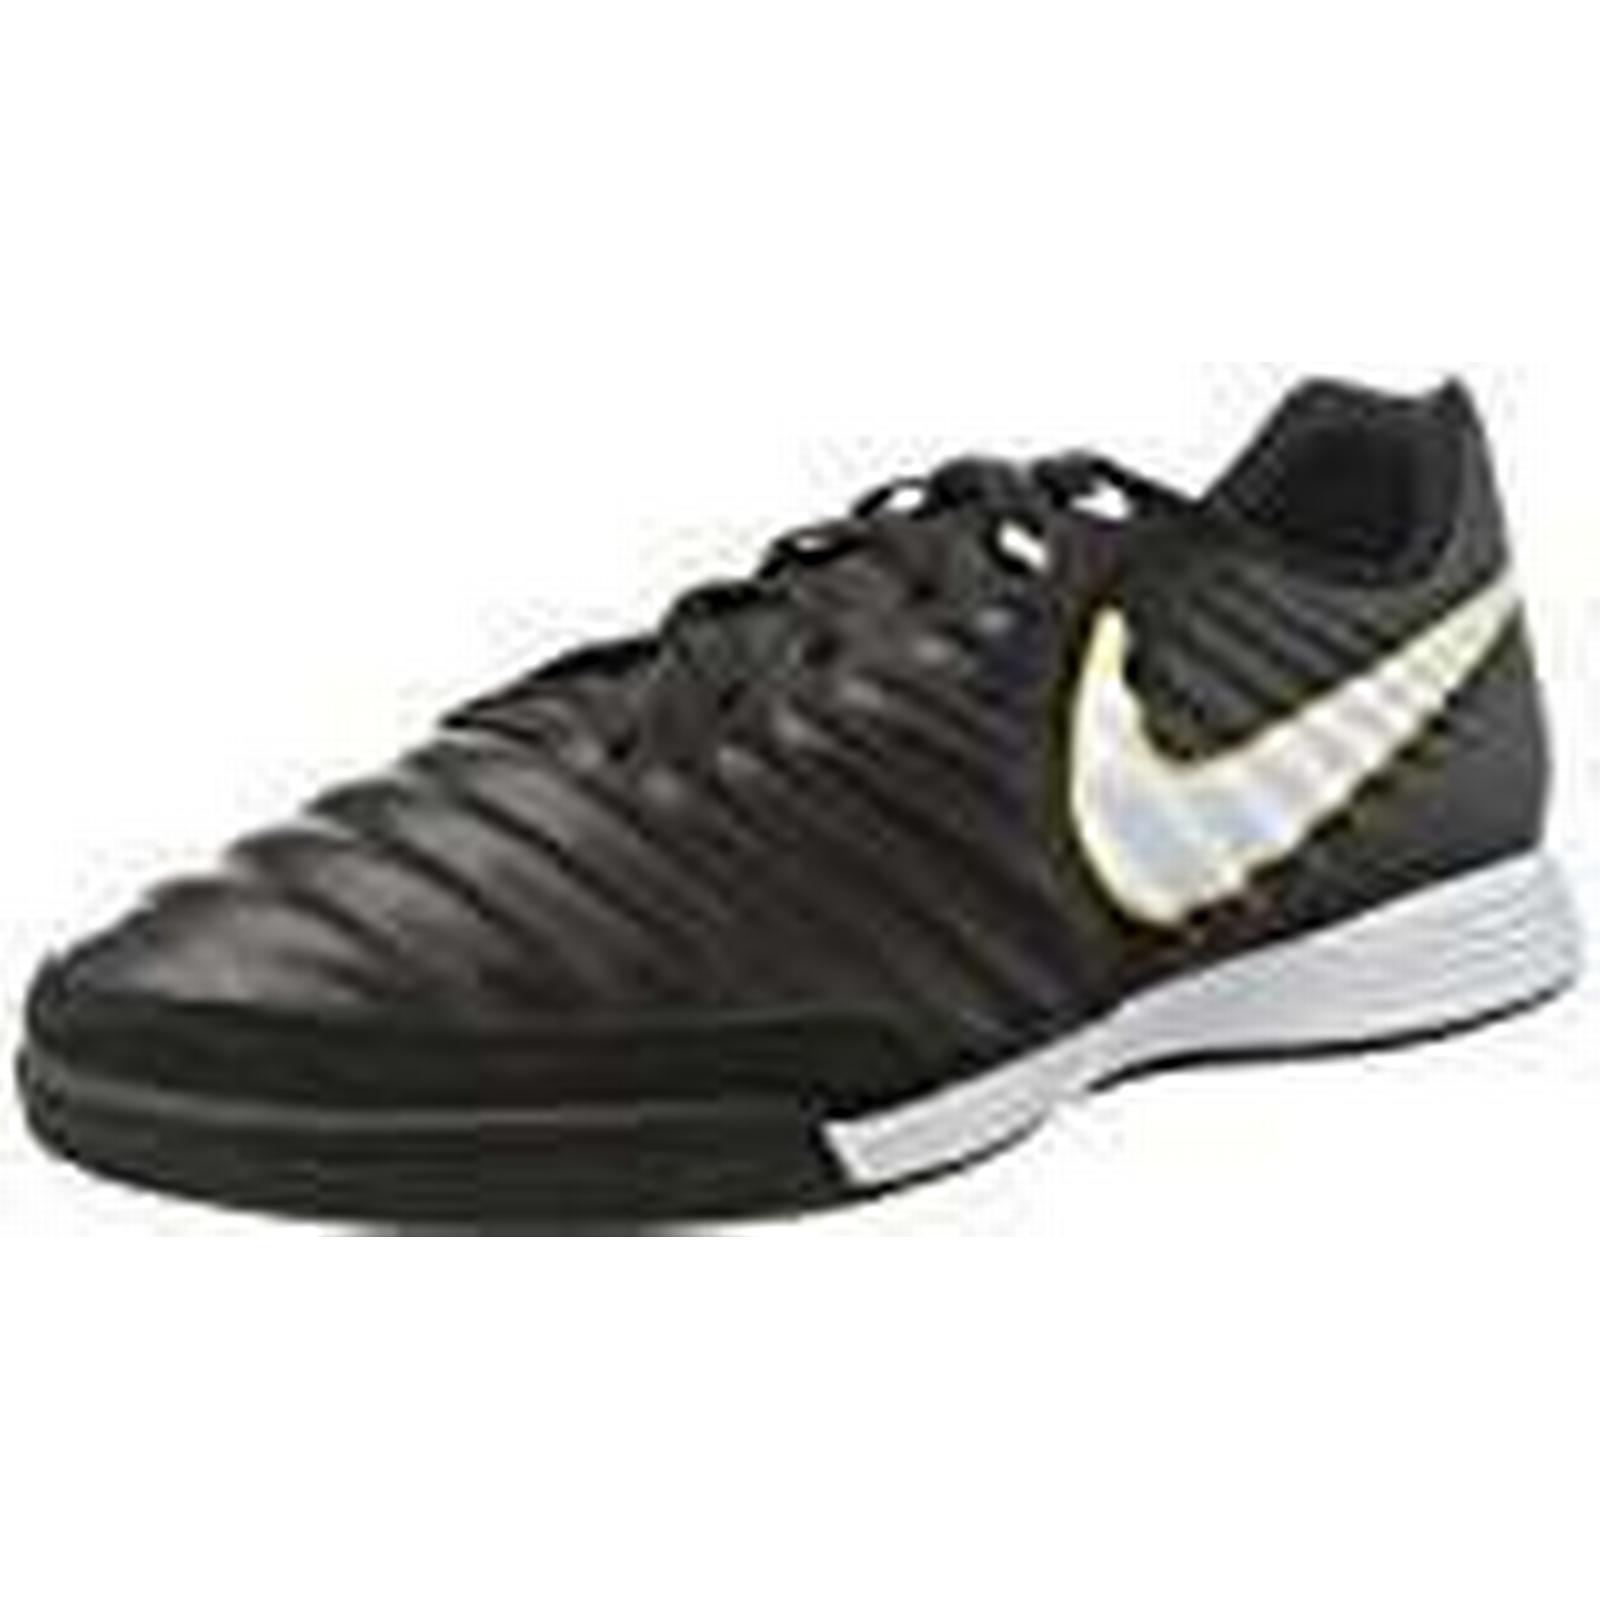 NIKE Men''s Tiempox Ligera Black/White, Iv Ic Football Boots, Black/White, Ligera 10 UK 45 EU 9d73ae